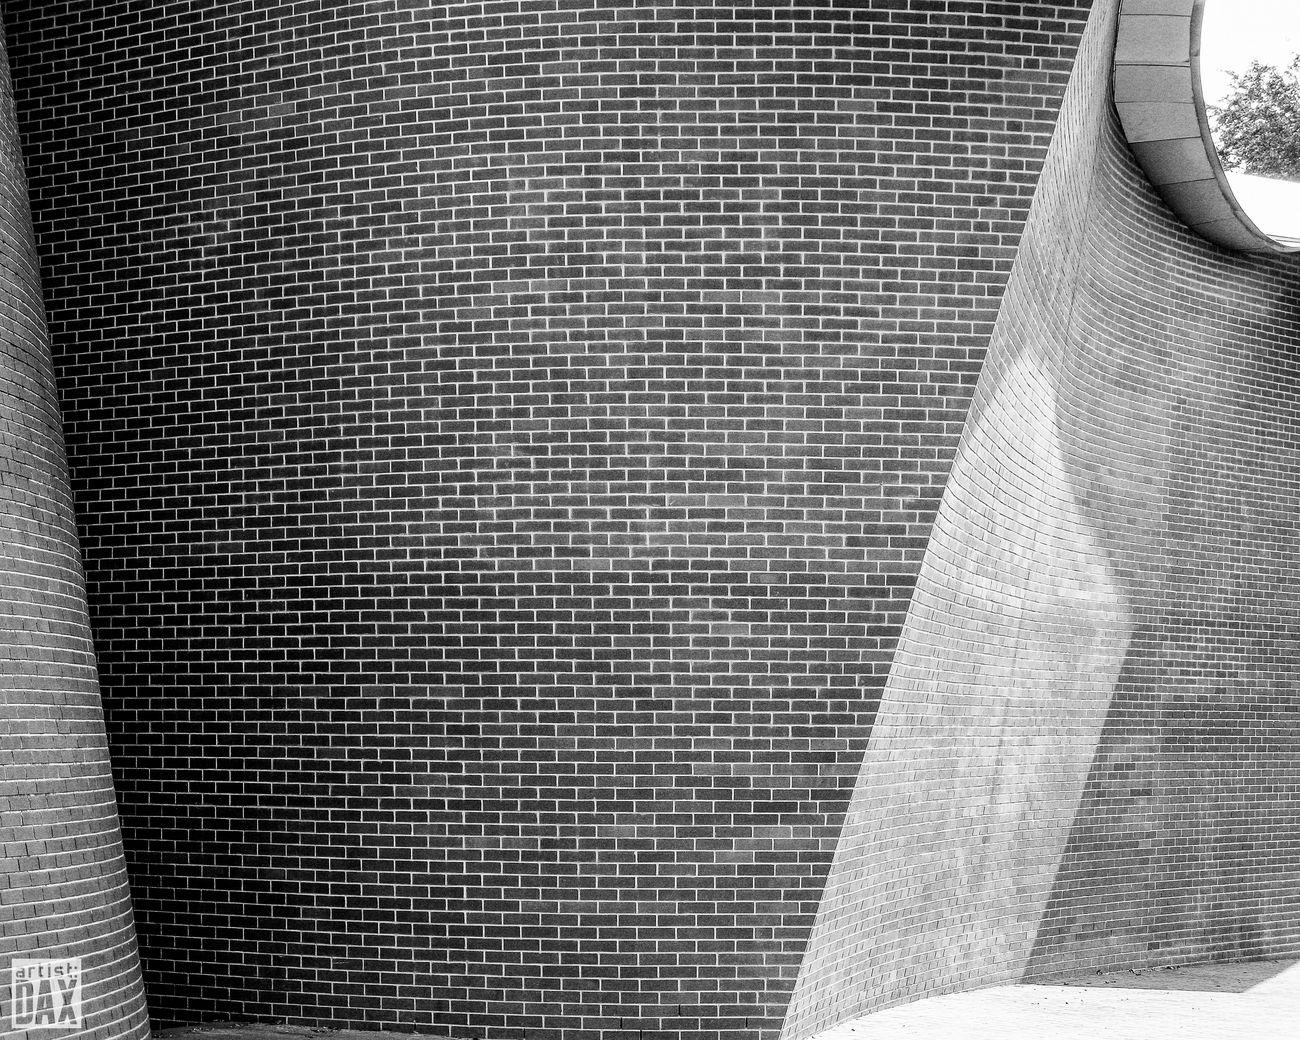 MARTA Herford 3 [ throwbackthursday ] artist:DAX PHOTOGRAPHOHOLIC | born to capture | ArtistDAX PHOTOGRAPHOHOLIC Architecture Mobilephotography_city Urbanexplorer Germany Cityexplorer Absract Architecture Urban Museum Marta Herford Urban Architecture Museum Blackandwhite Monochrome _ Collection Nordrhein-Westfalen Northrhein Westfalia Showcase: June EyeEm Best Shots - Architecture EyeEm Gallery Monochrome Travelgermany Silenceinthecity